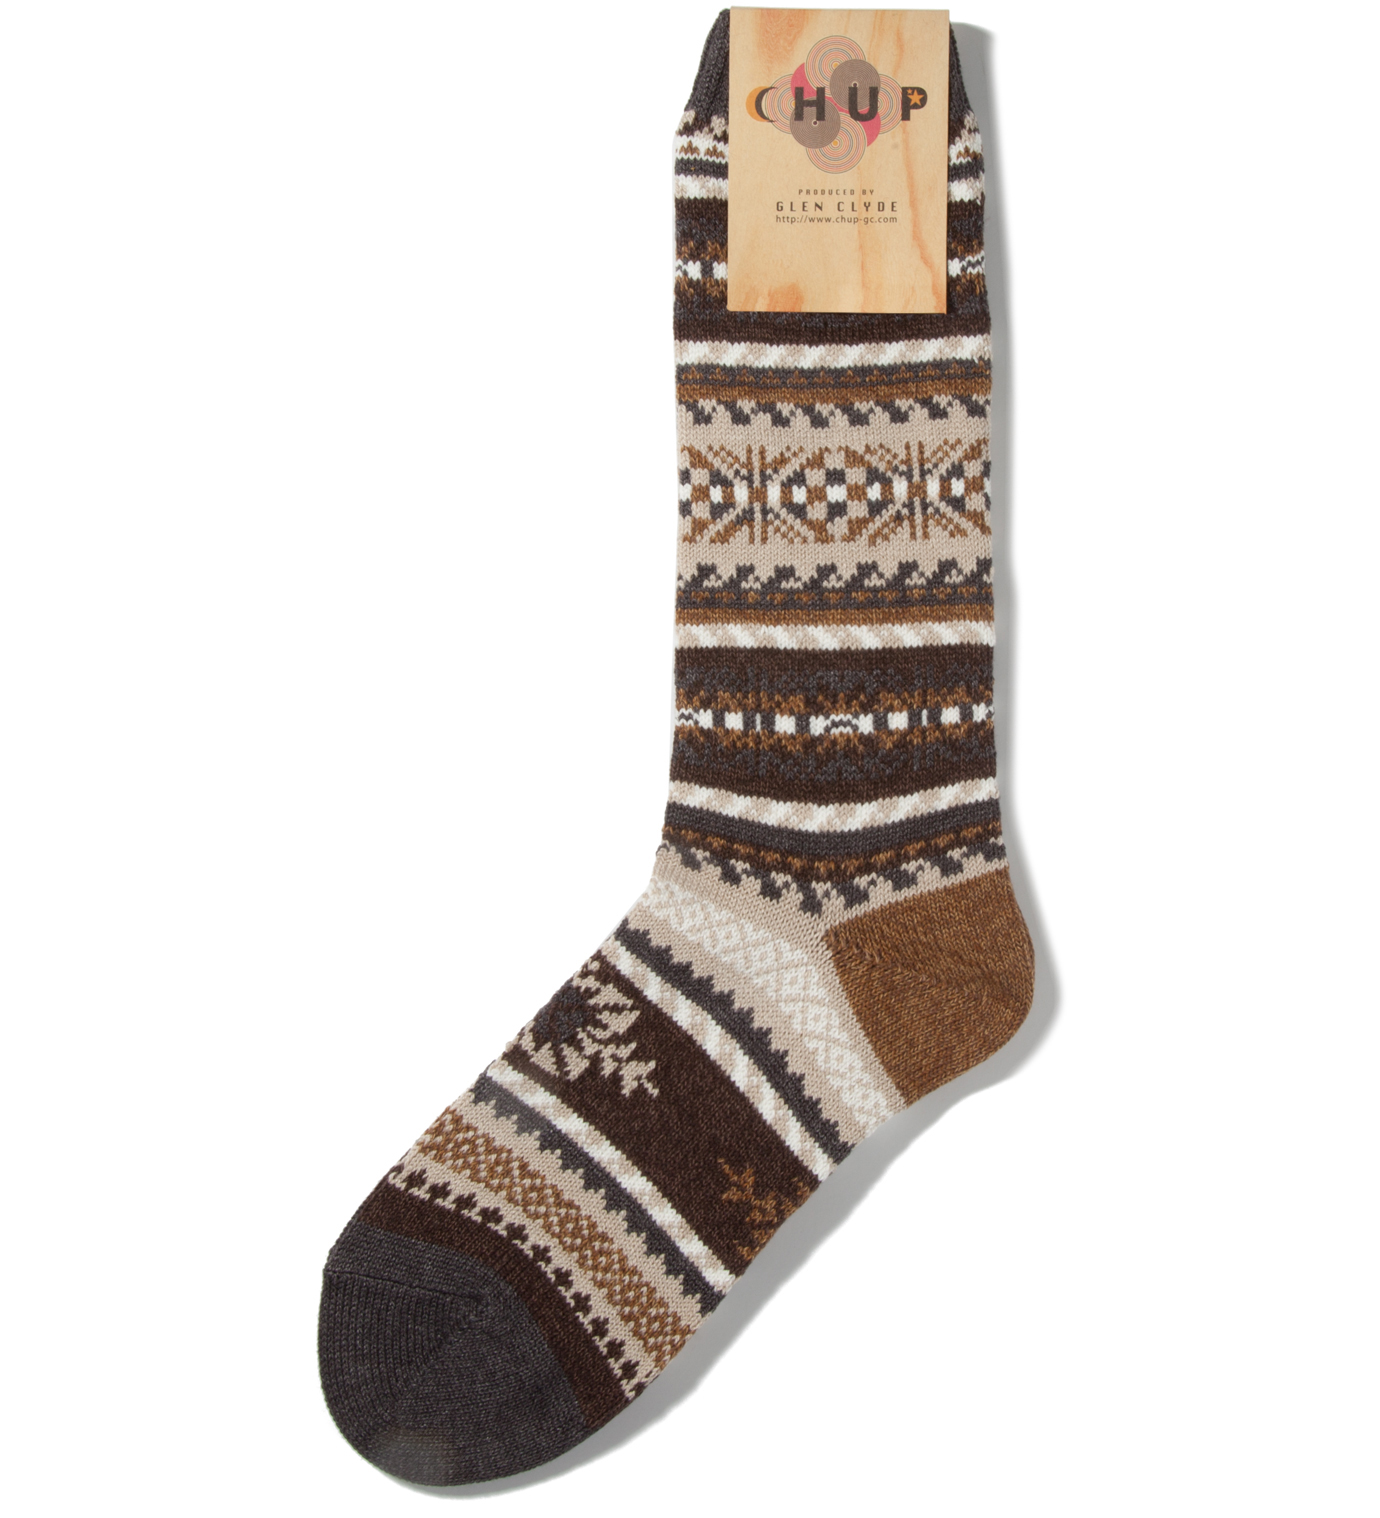 CHUP Grey Loimi Socks